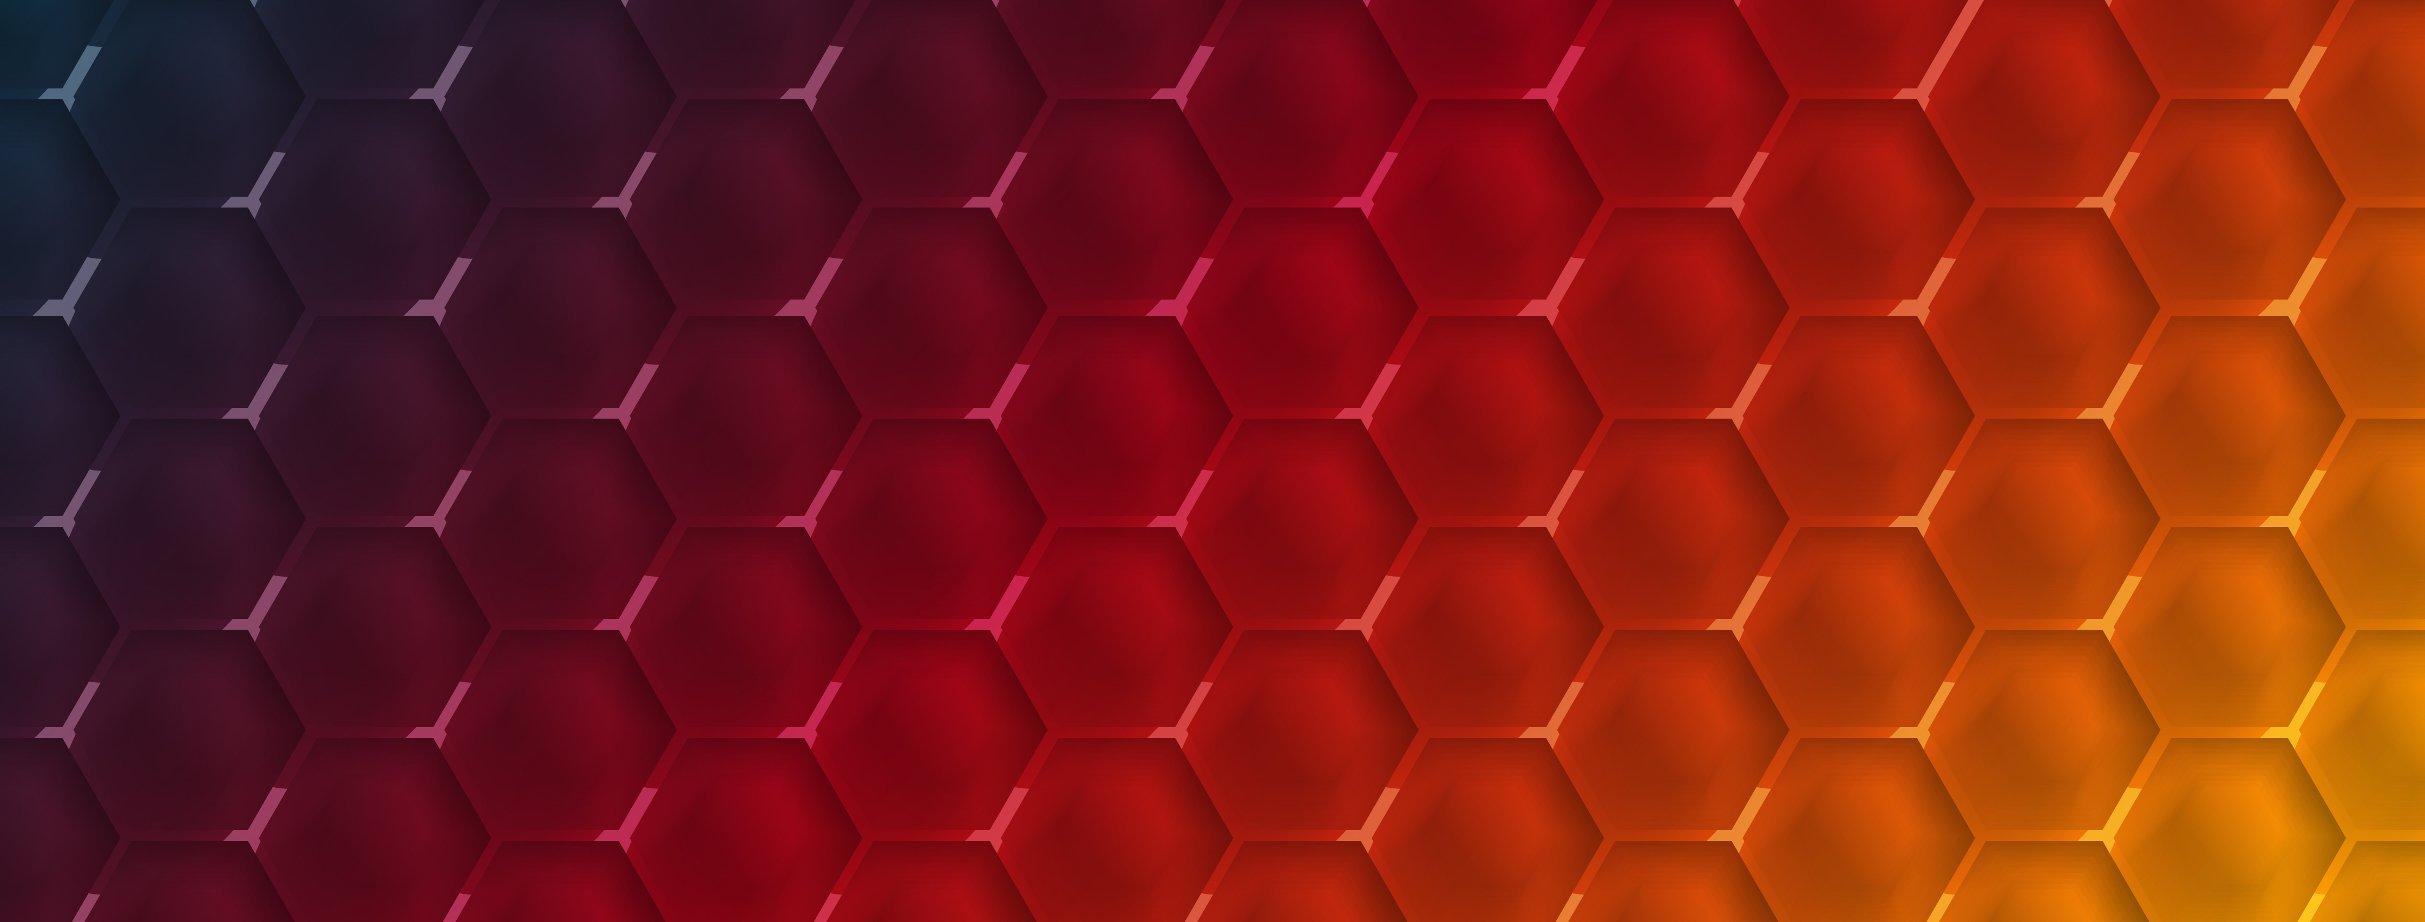 griglia-rossa